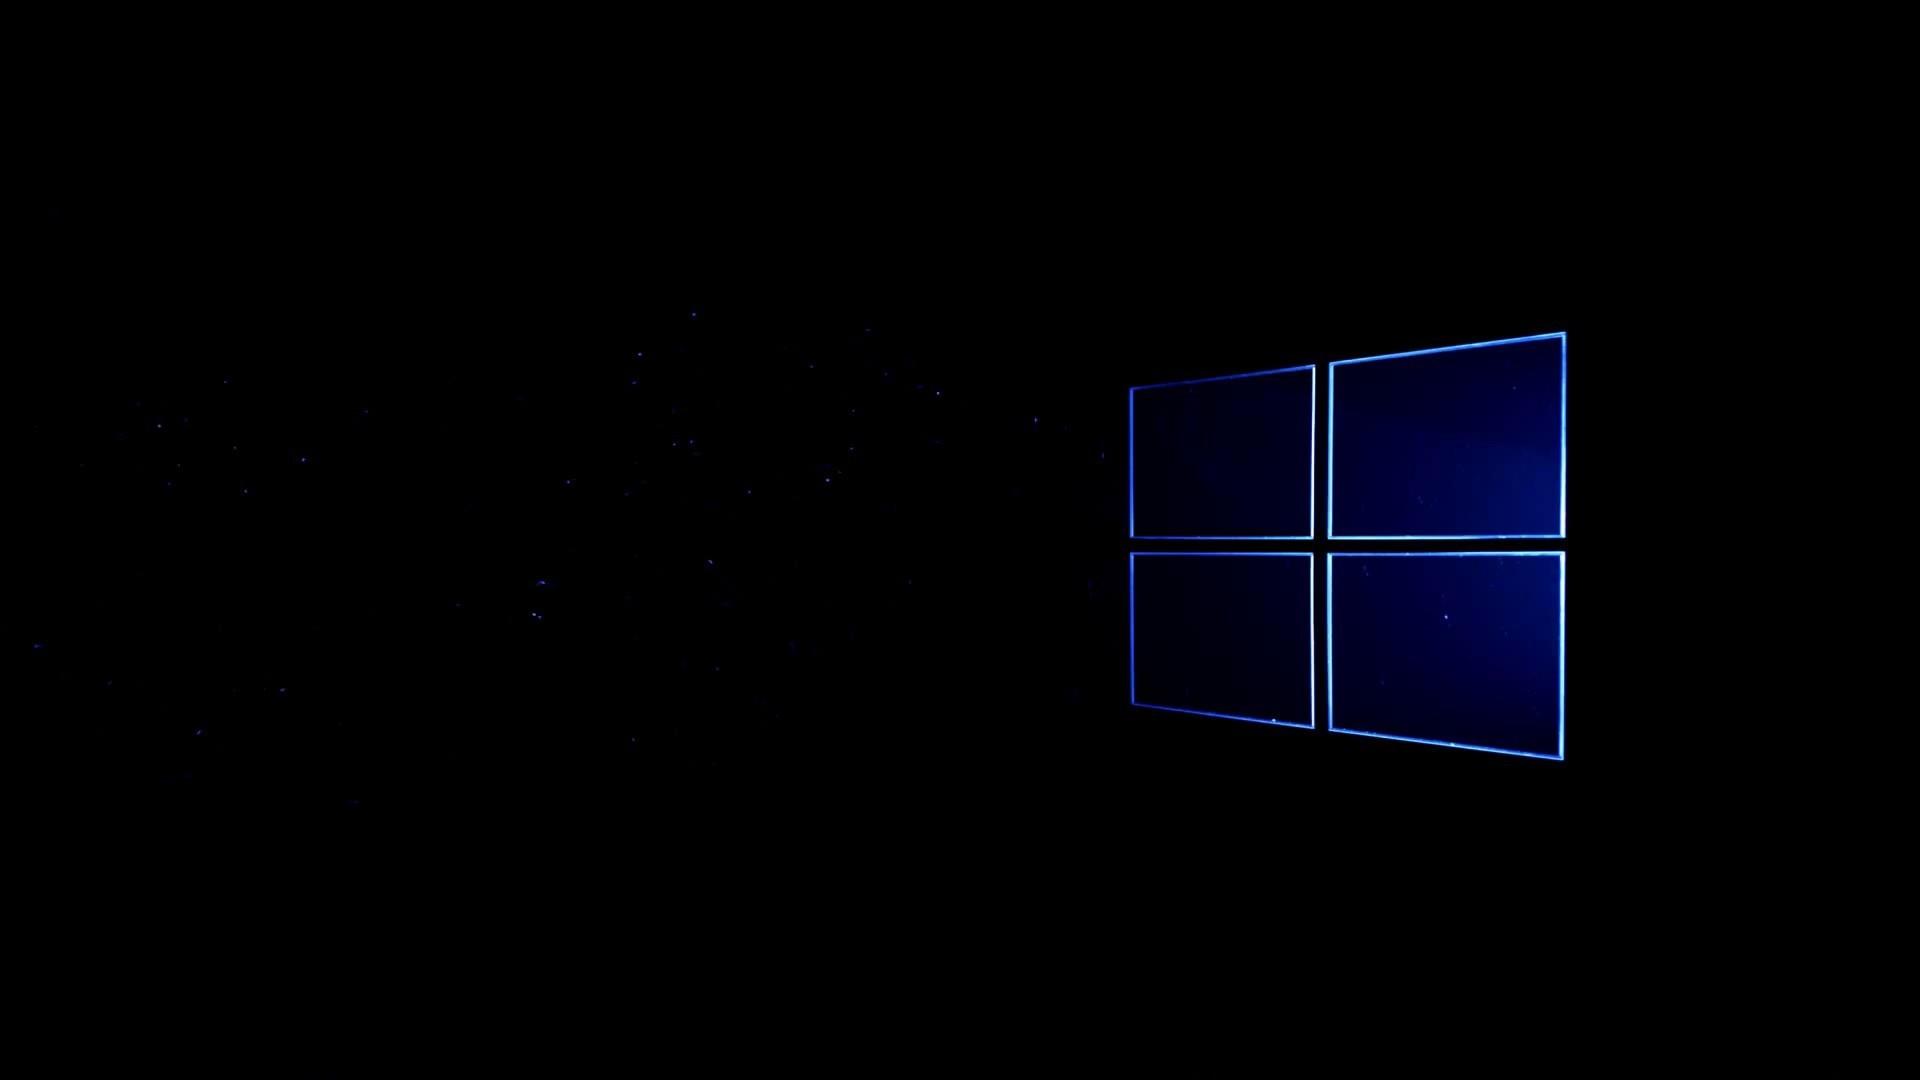 Screensavers Wallpaper Windows 10 (66+ images)